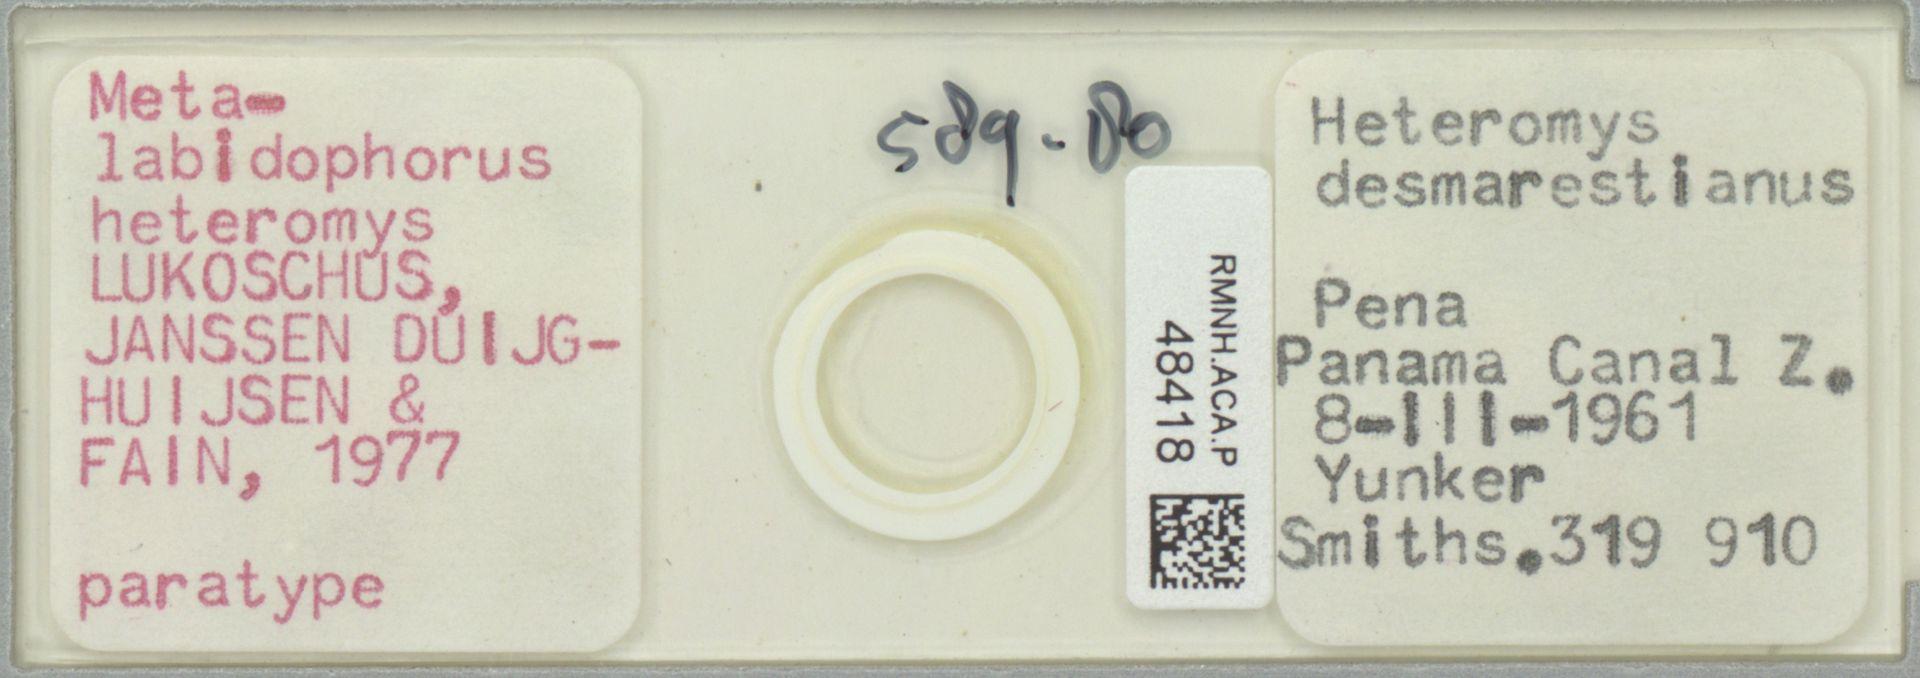 RMNH.ACA.P.48418 | Metalabidophorus heteromys LUKOSCHUS, JANSSEN DUIJGHUIJSEN & FAIN, 1977